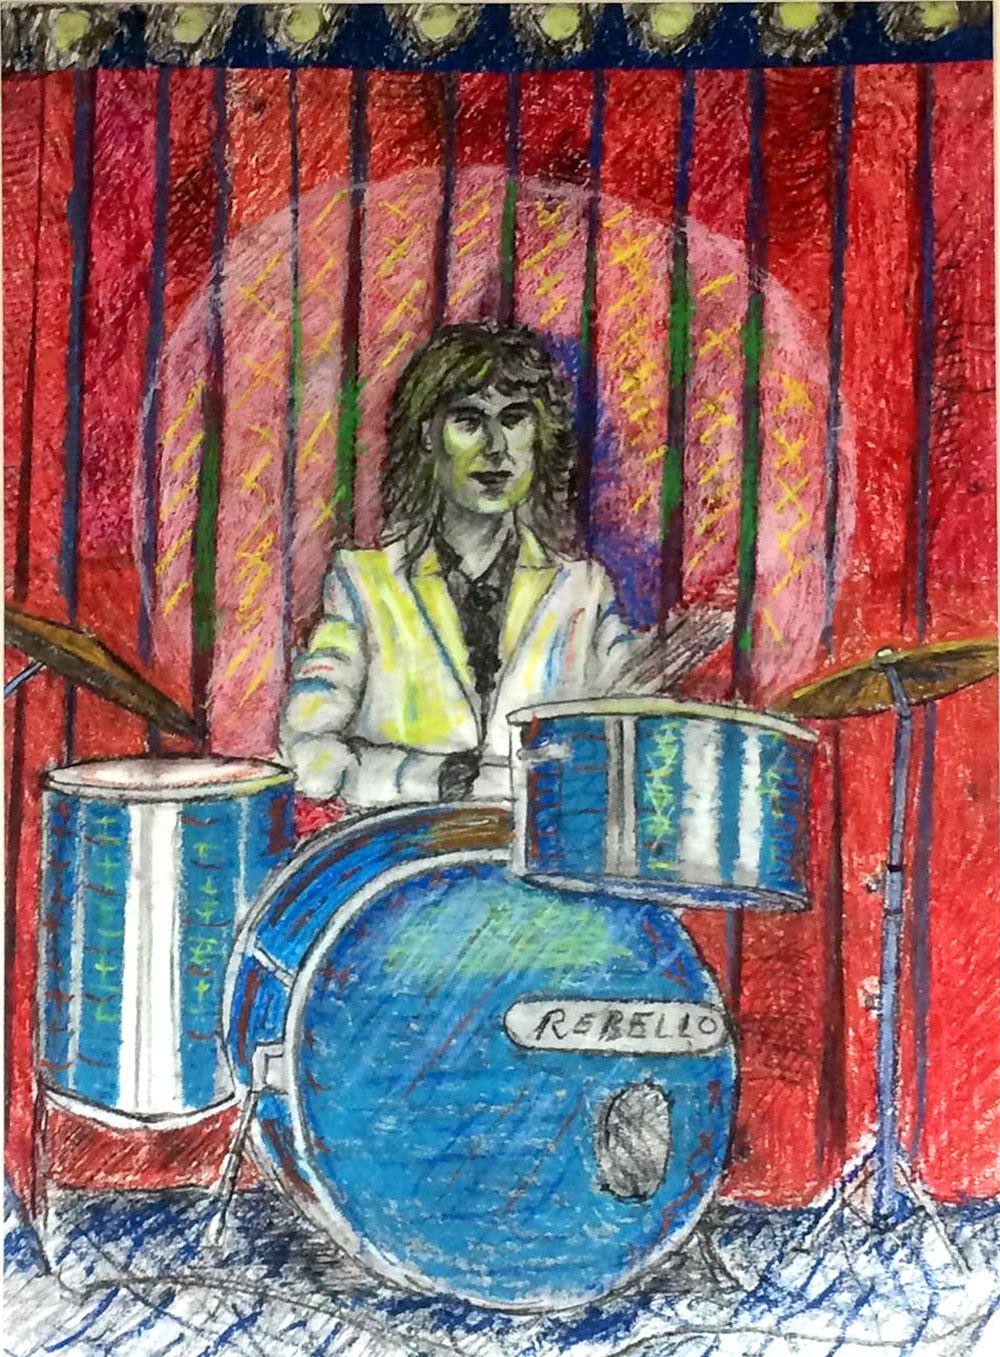 Piers Butler artisit - Michael drummer. drawing